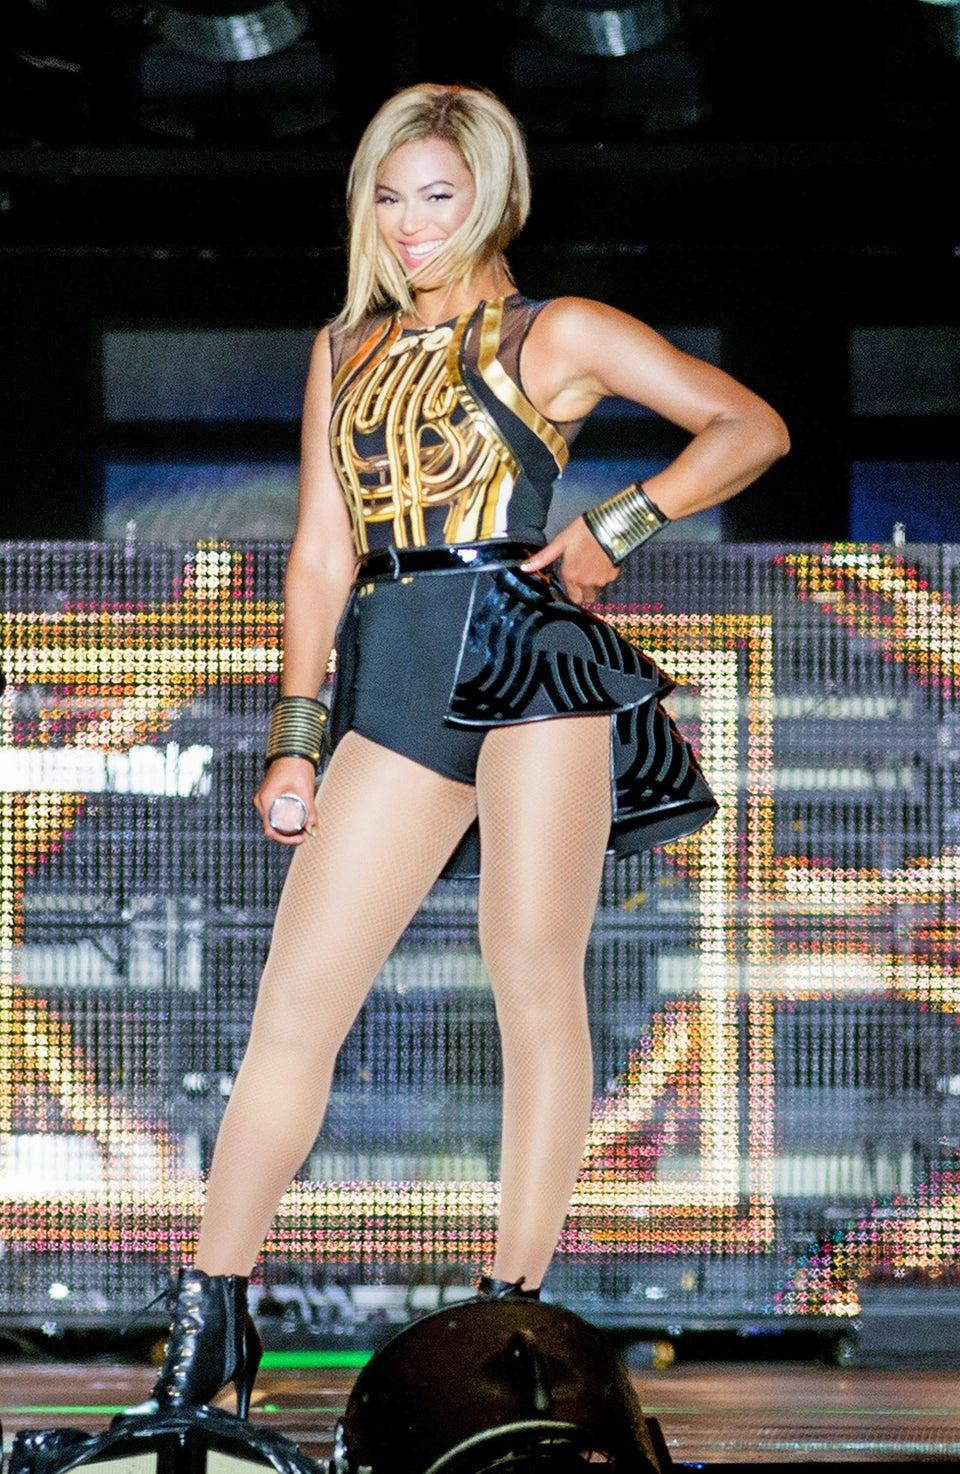 Coffee Talk: Beyoncé Wins Emmy for Super Bowl Halftime Show